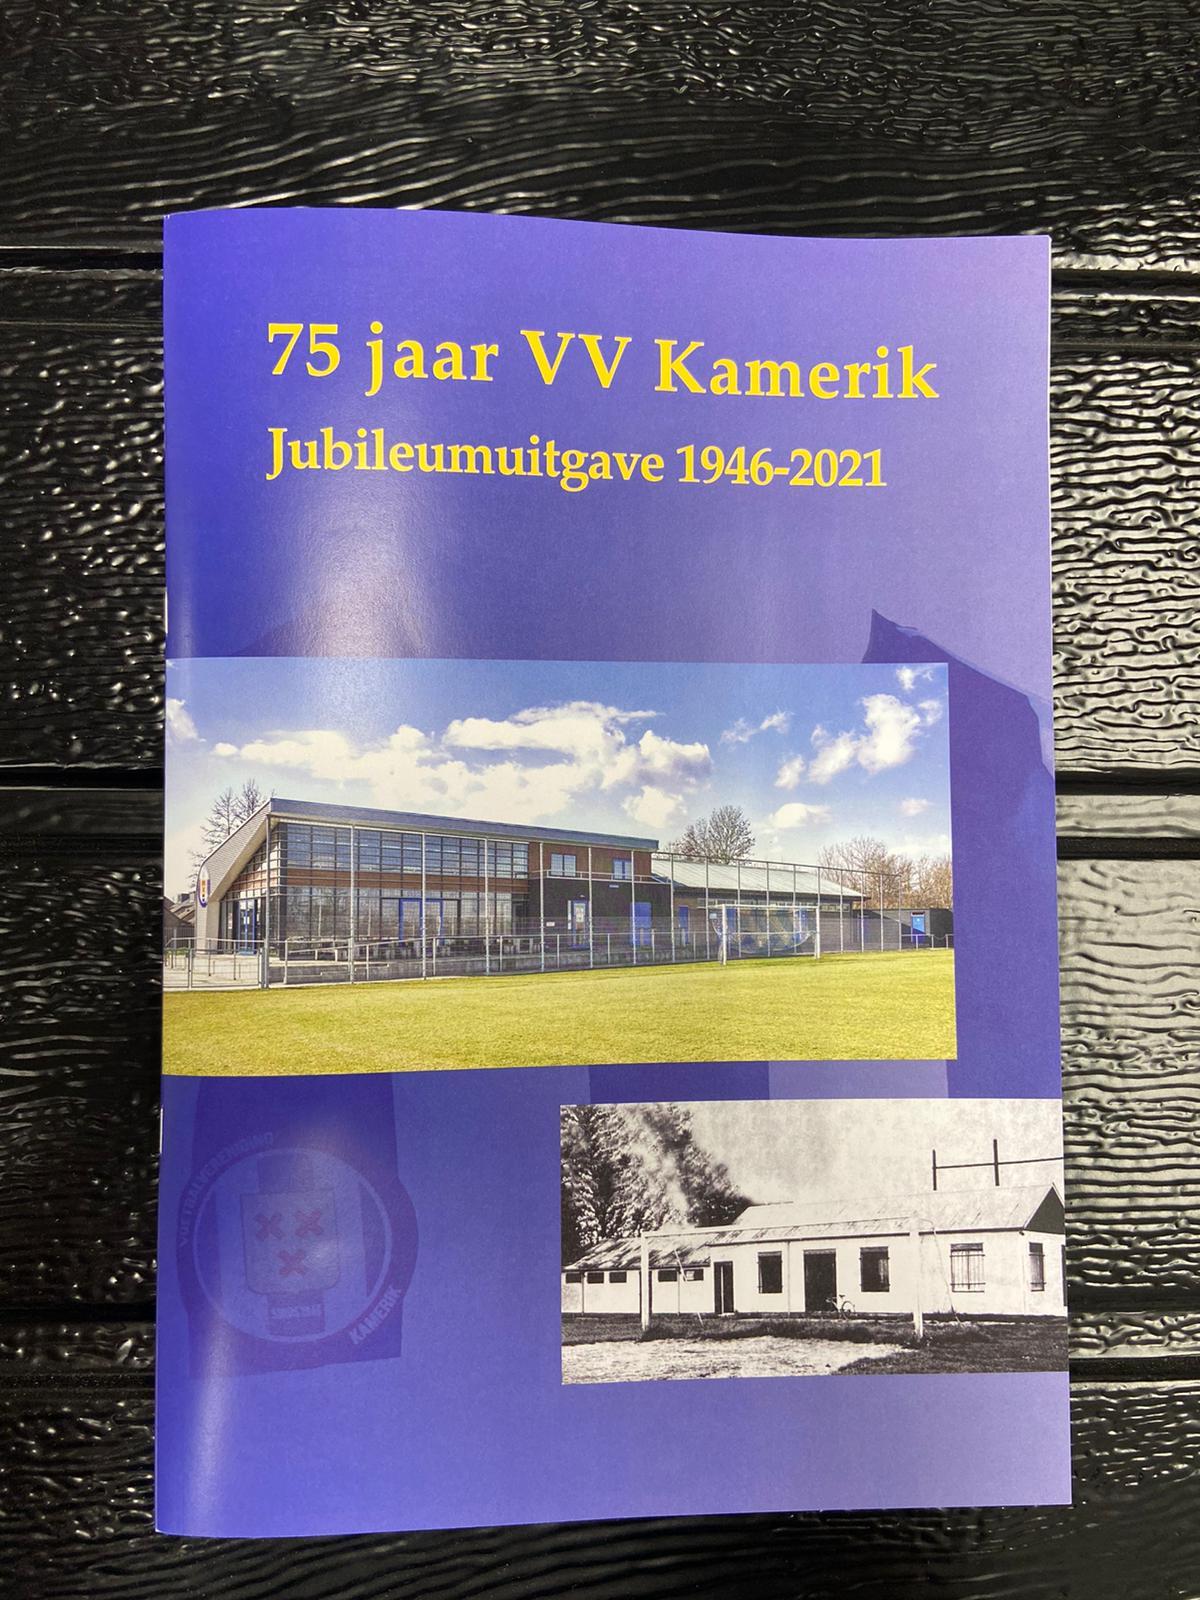 75 jarig jubileum voetbalvereniging Kamerik